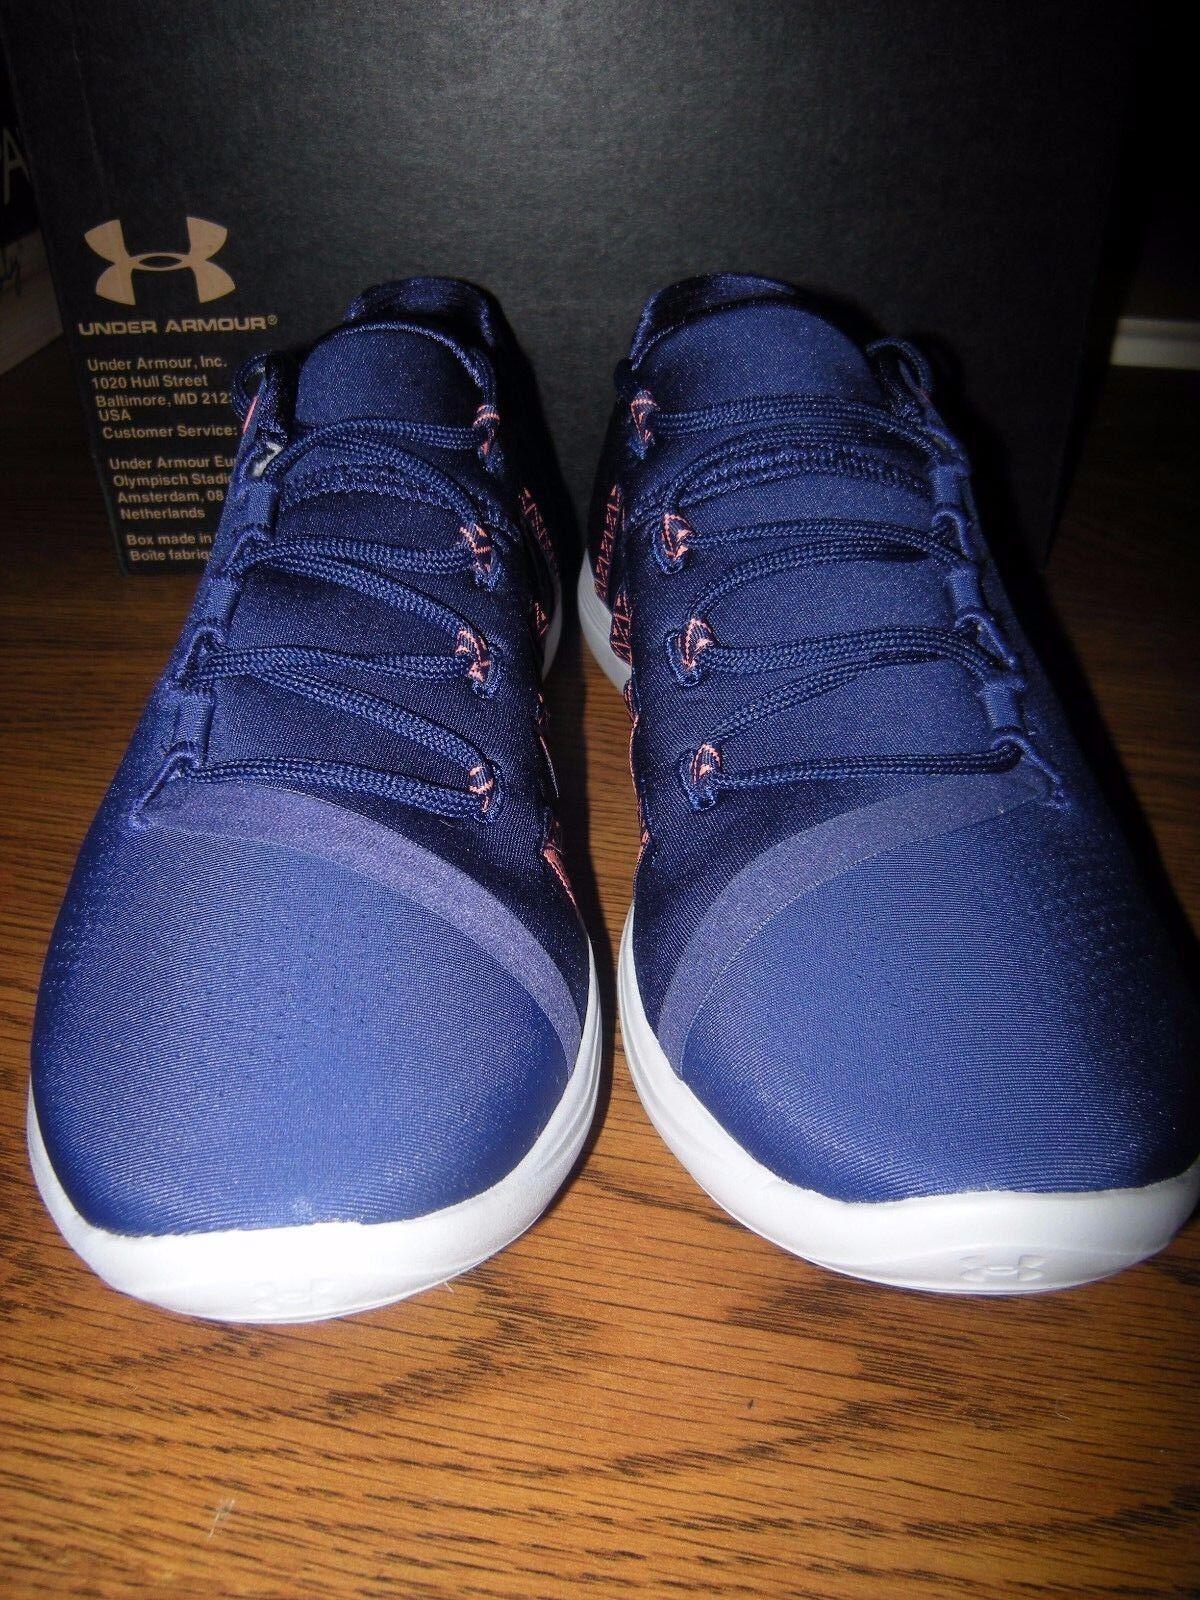 Brand New Damenschuhe Blau & Orange Under Armour Street Precision Tennis Schuhes, 6.5